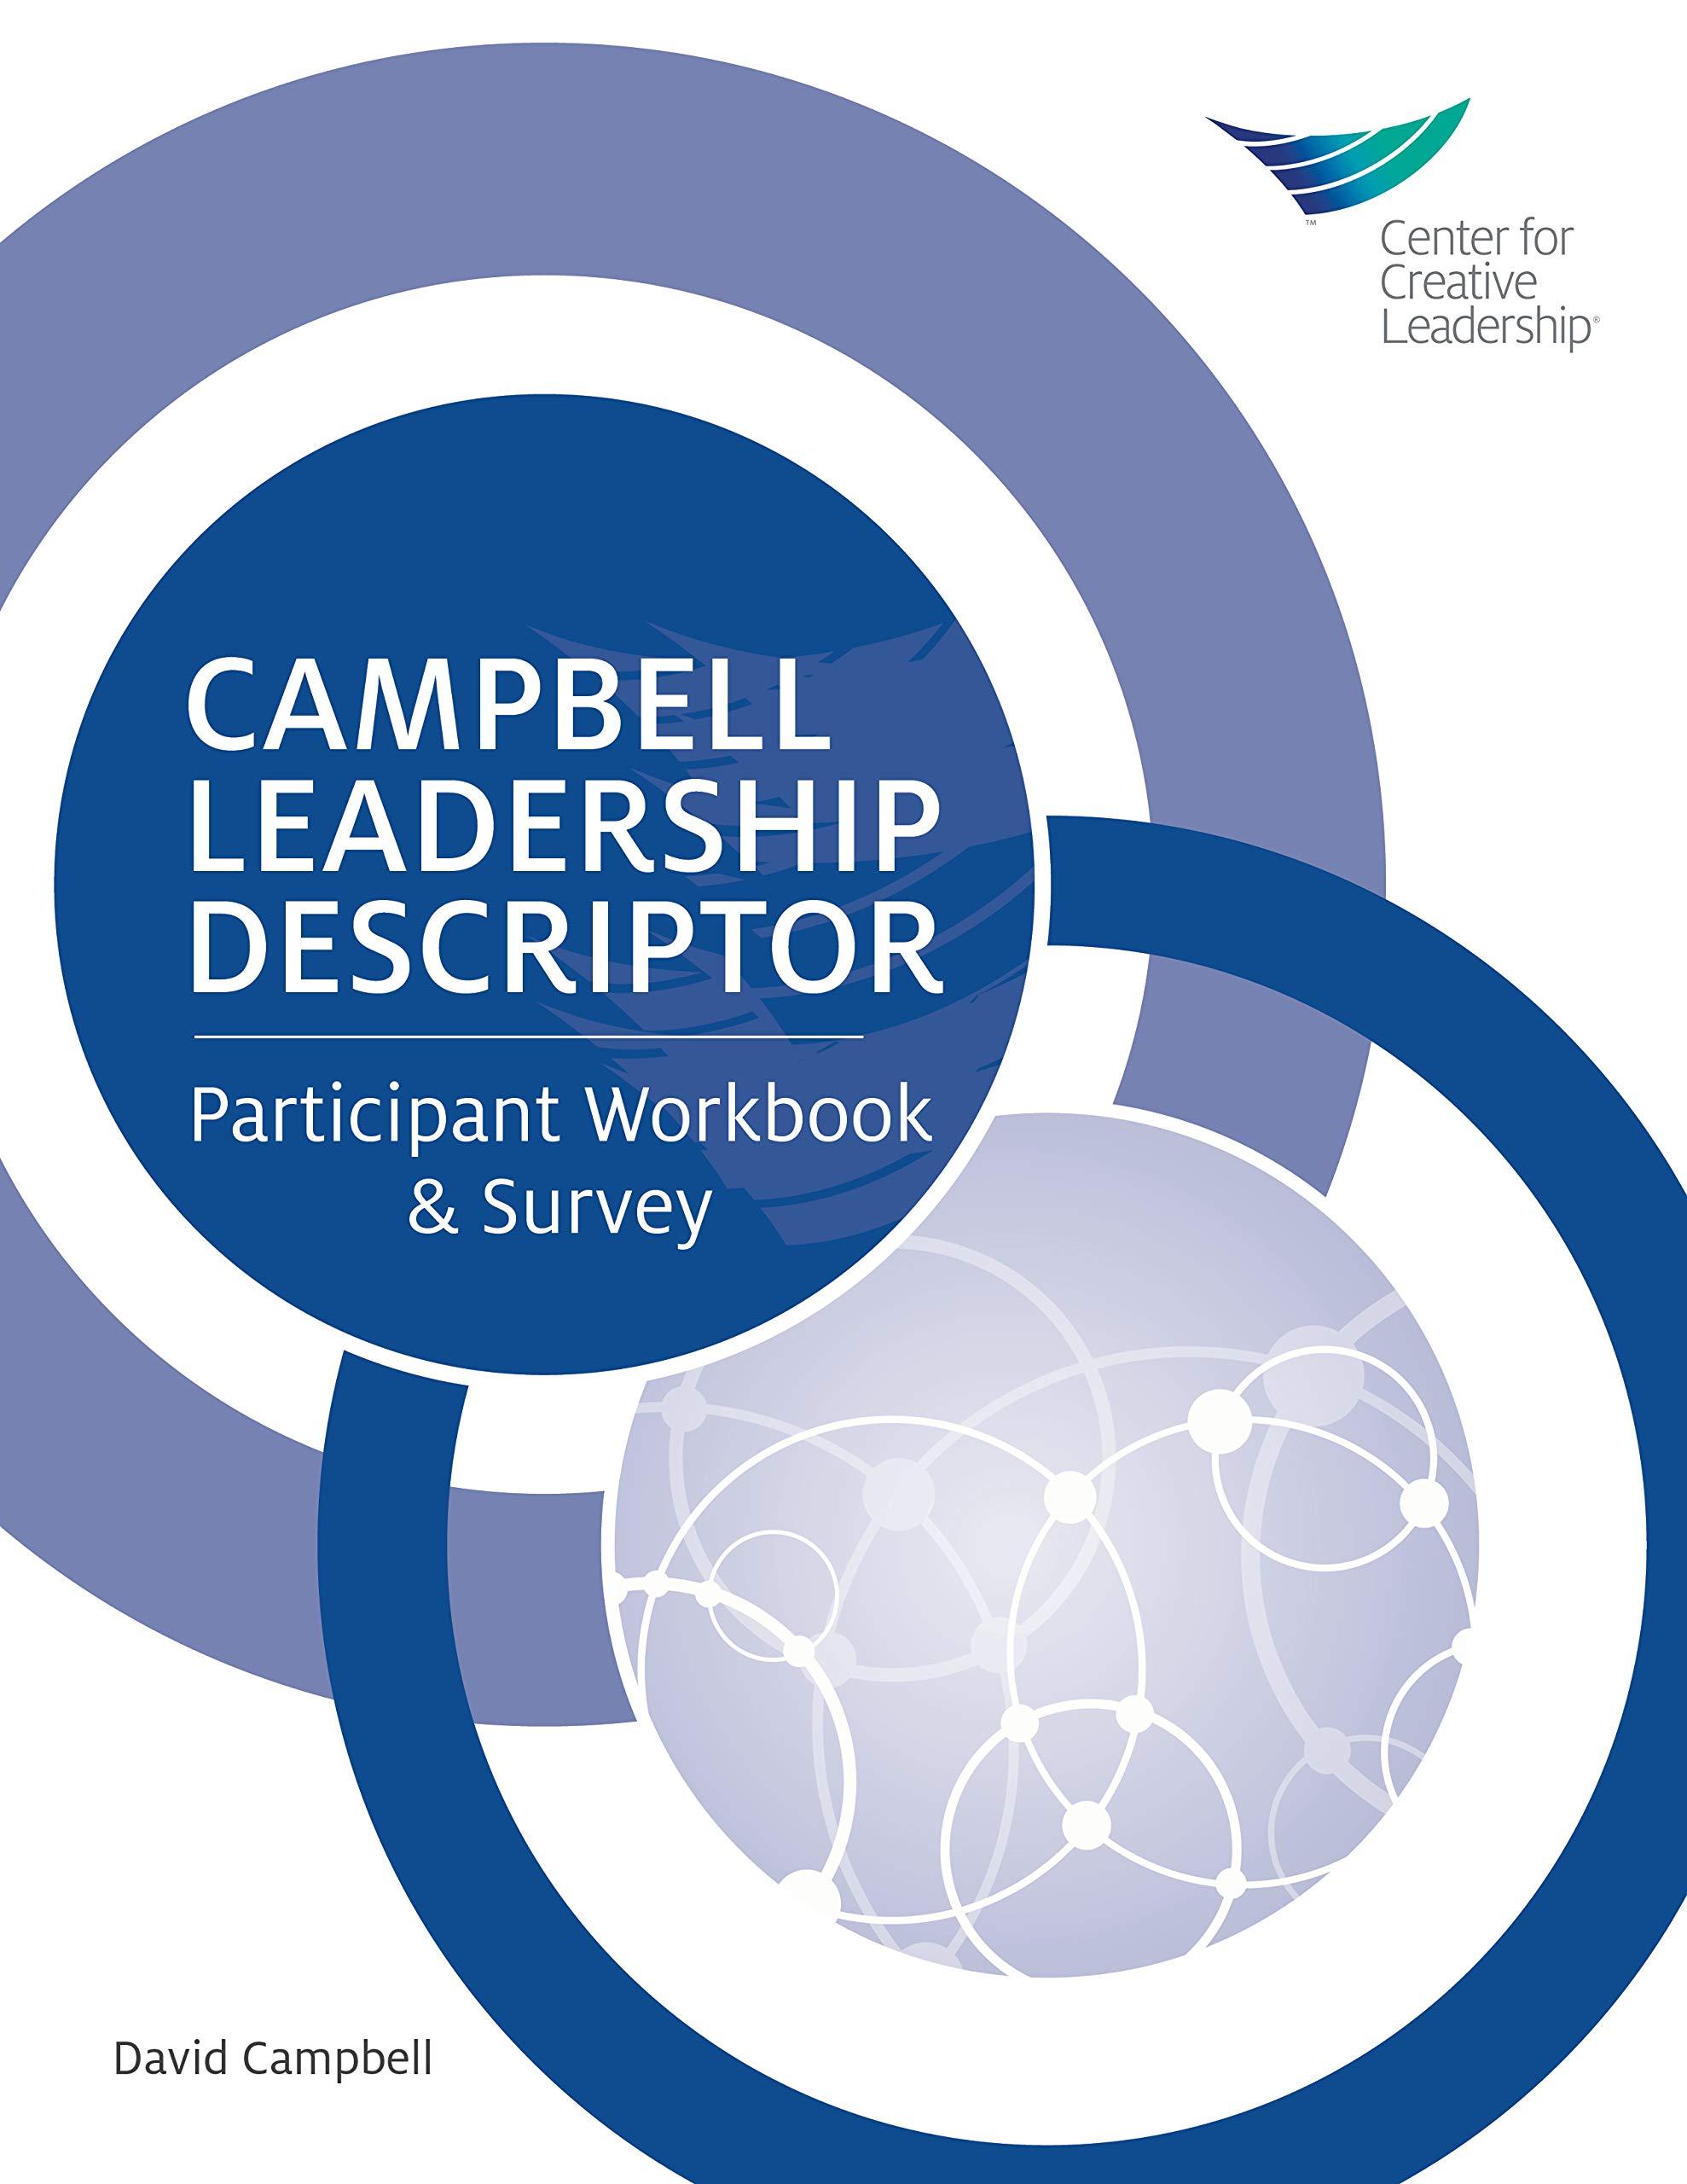 Campbell Leadership Descriptor Participant Workbook & Survey